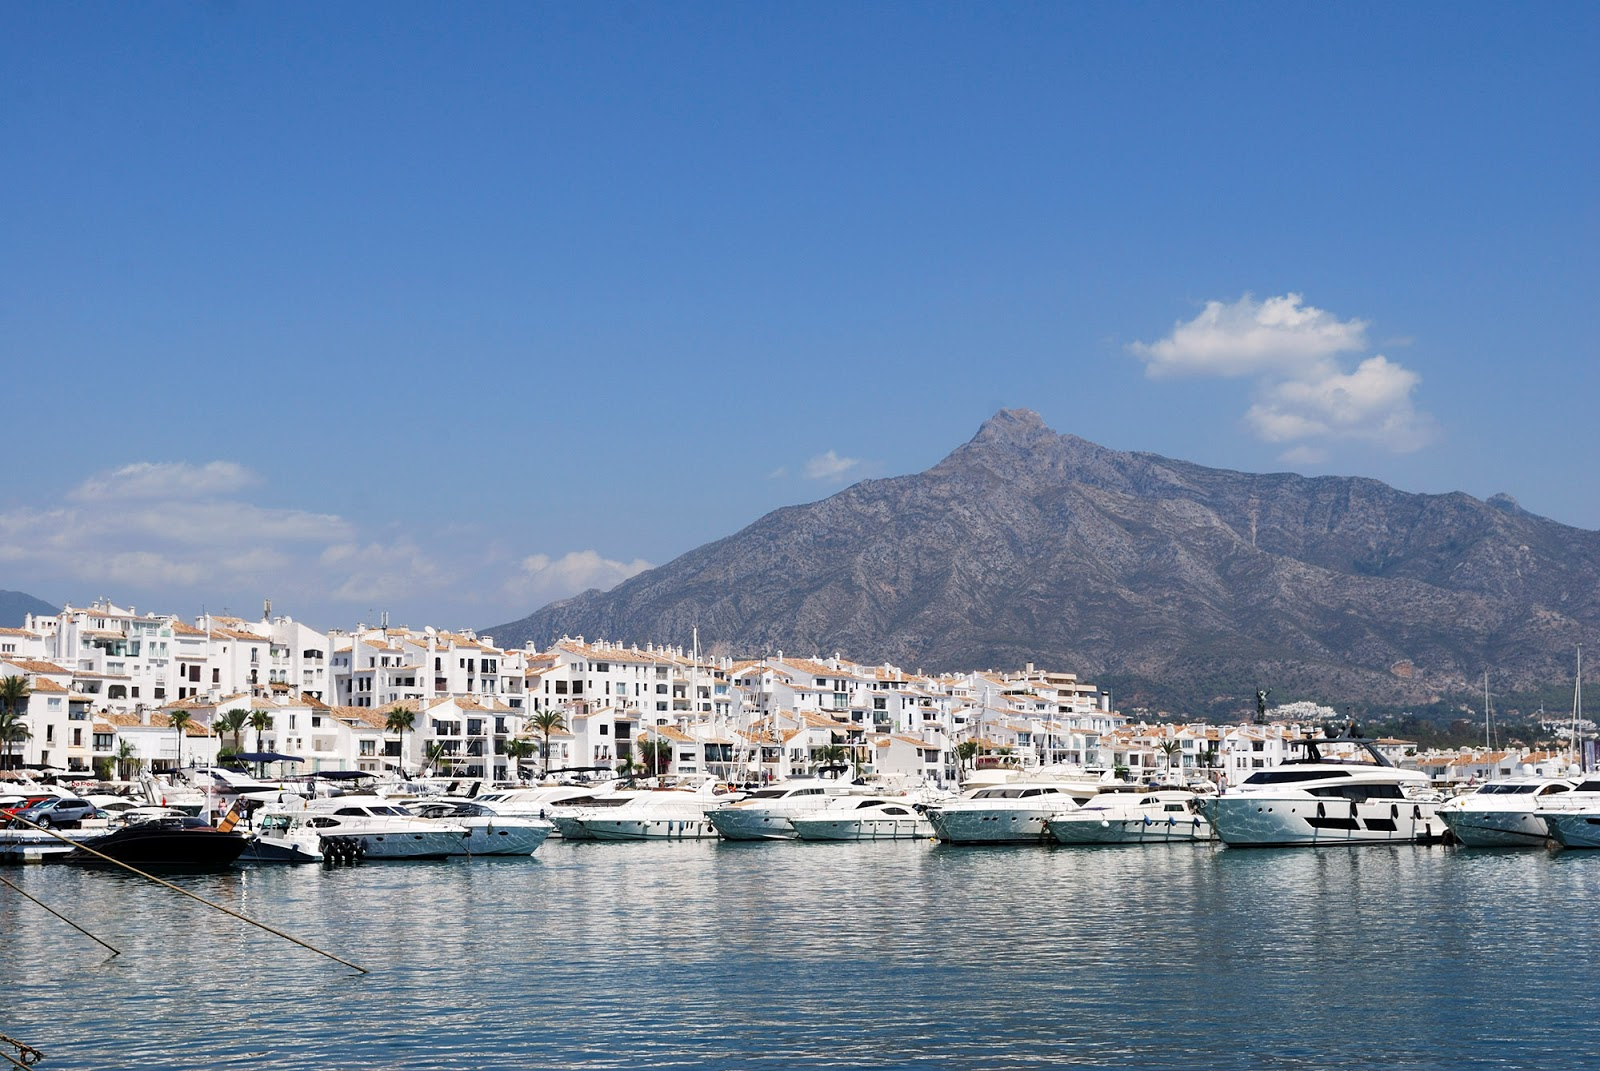 puerto banus marbella malaga spain marina